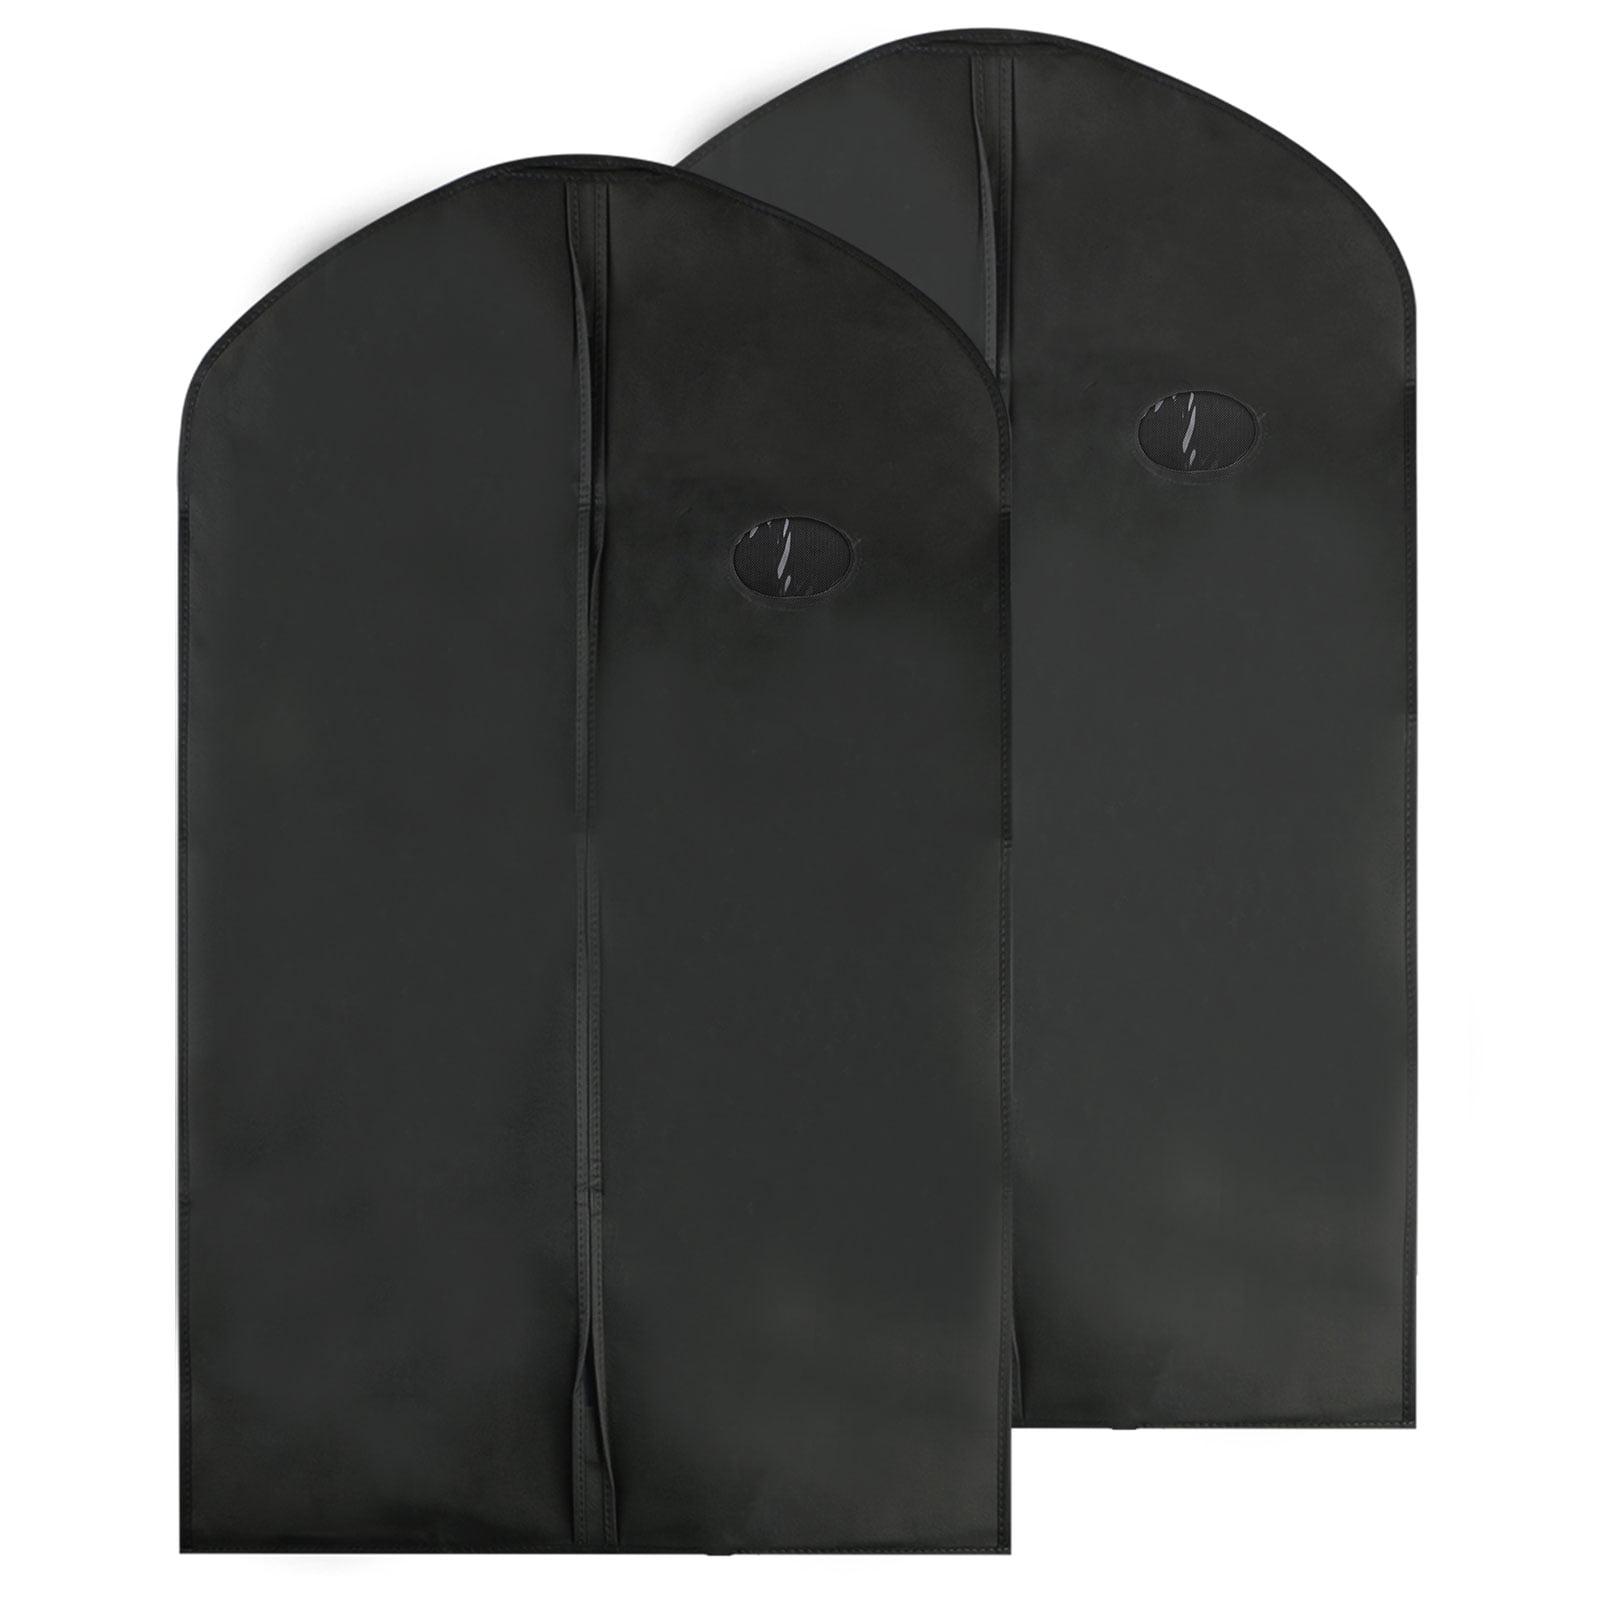 4 Suit bag Garment bag Dress Cover//Storage//Travel Bag Dust Proof//Breathable-Navy